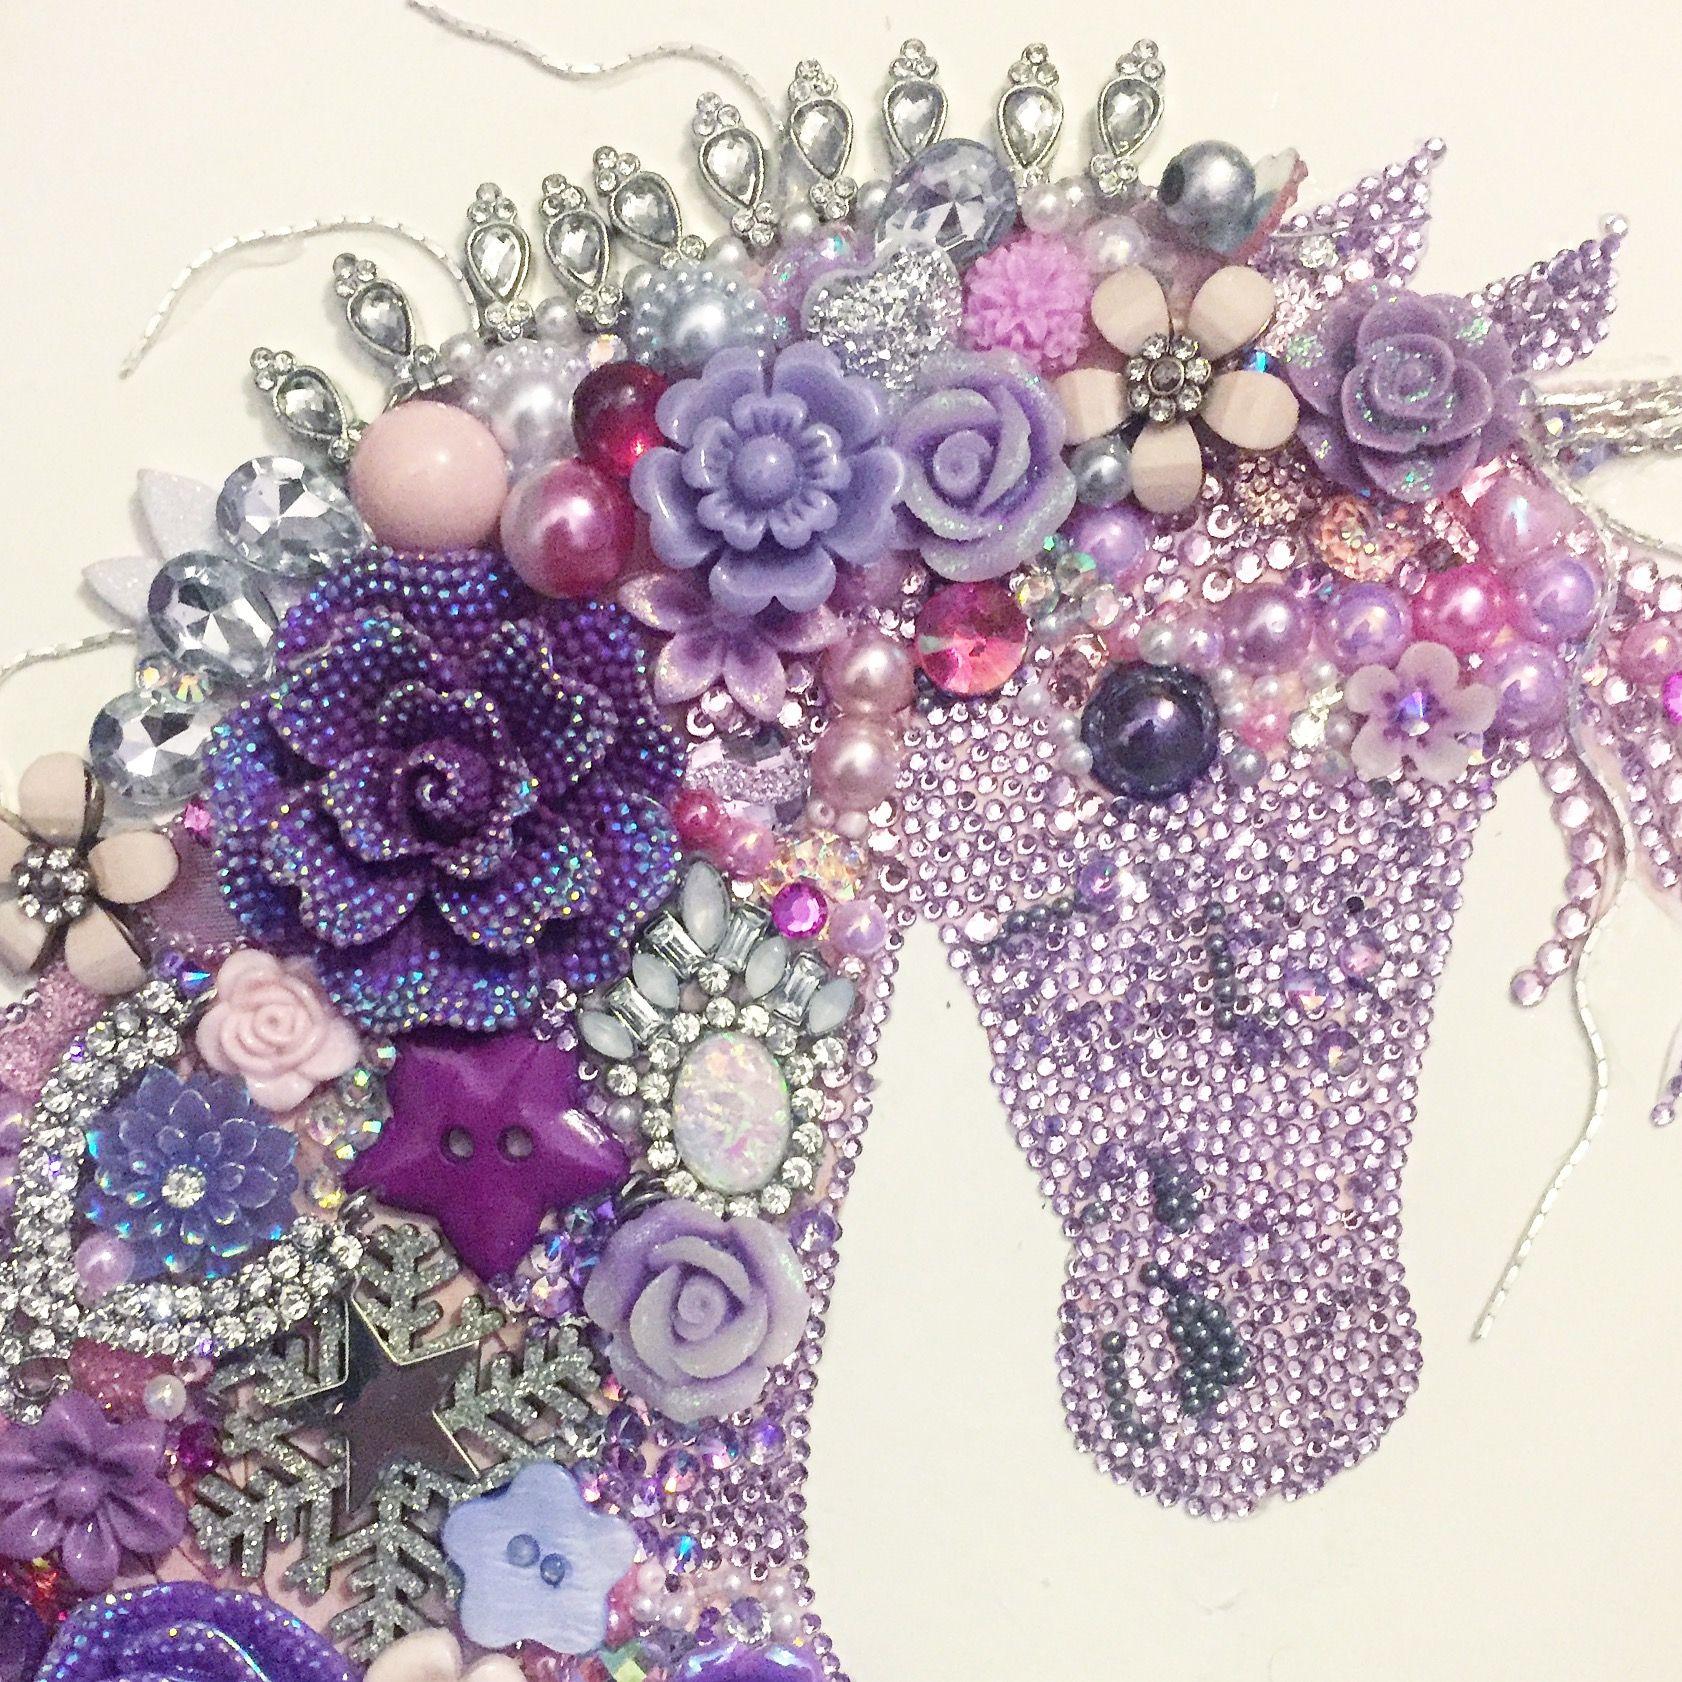 Unicorn button art and mixed media £65.00 plus postage ...